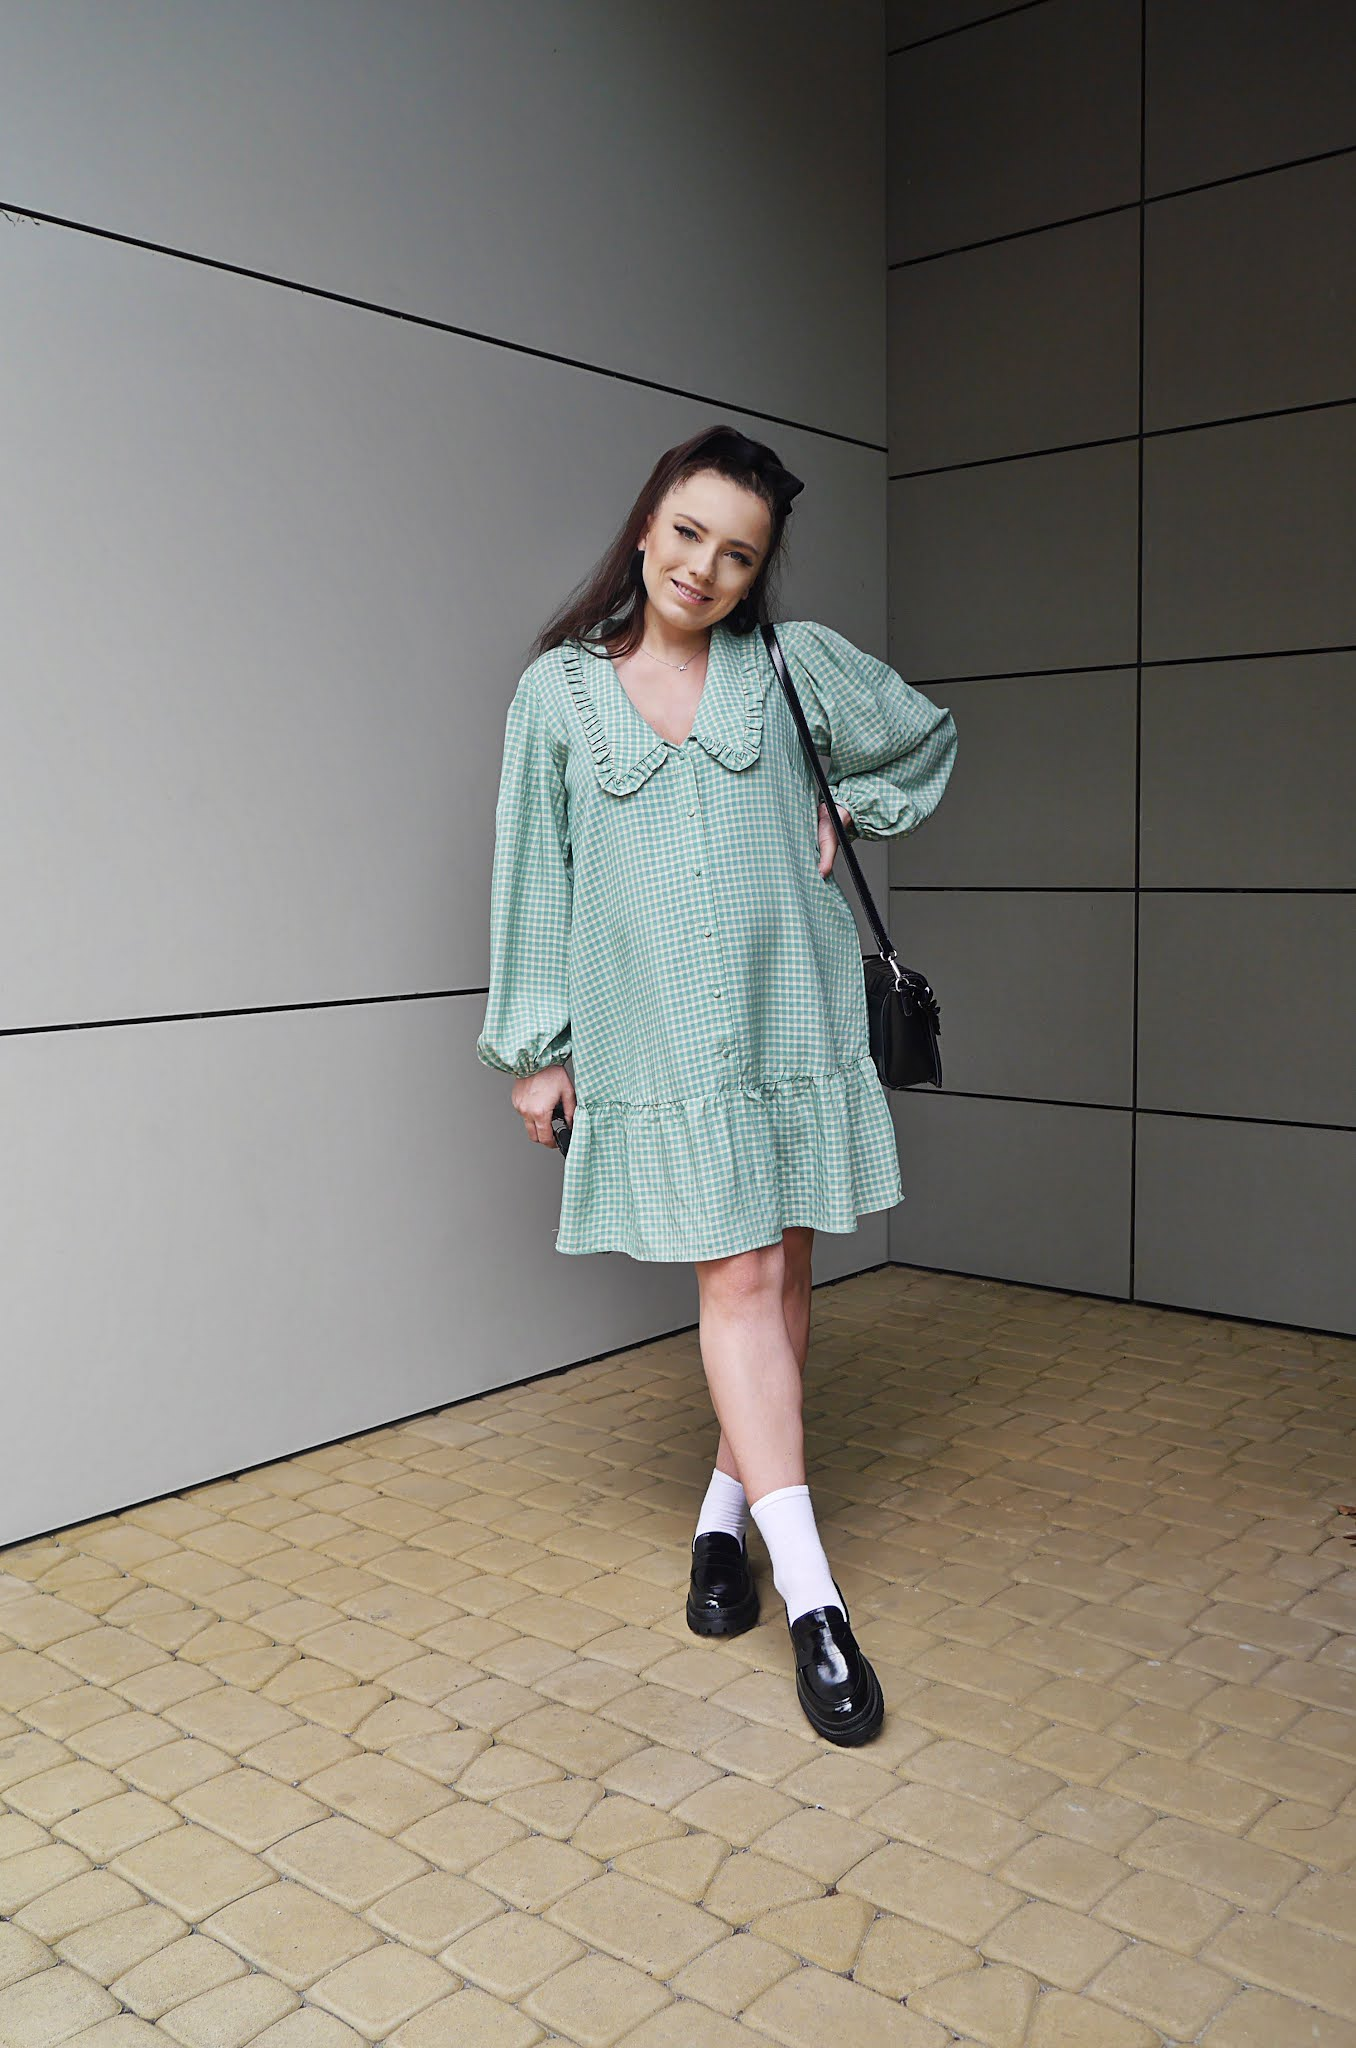 fashion blogger babydoll dress plaform shoes ccc black retro socks sunglasses pregnancy look outfit inspiration preggo ootd karyn puławy